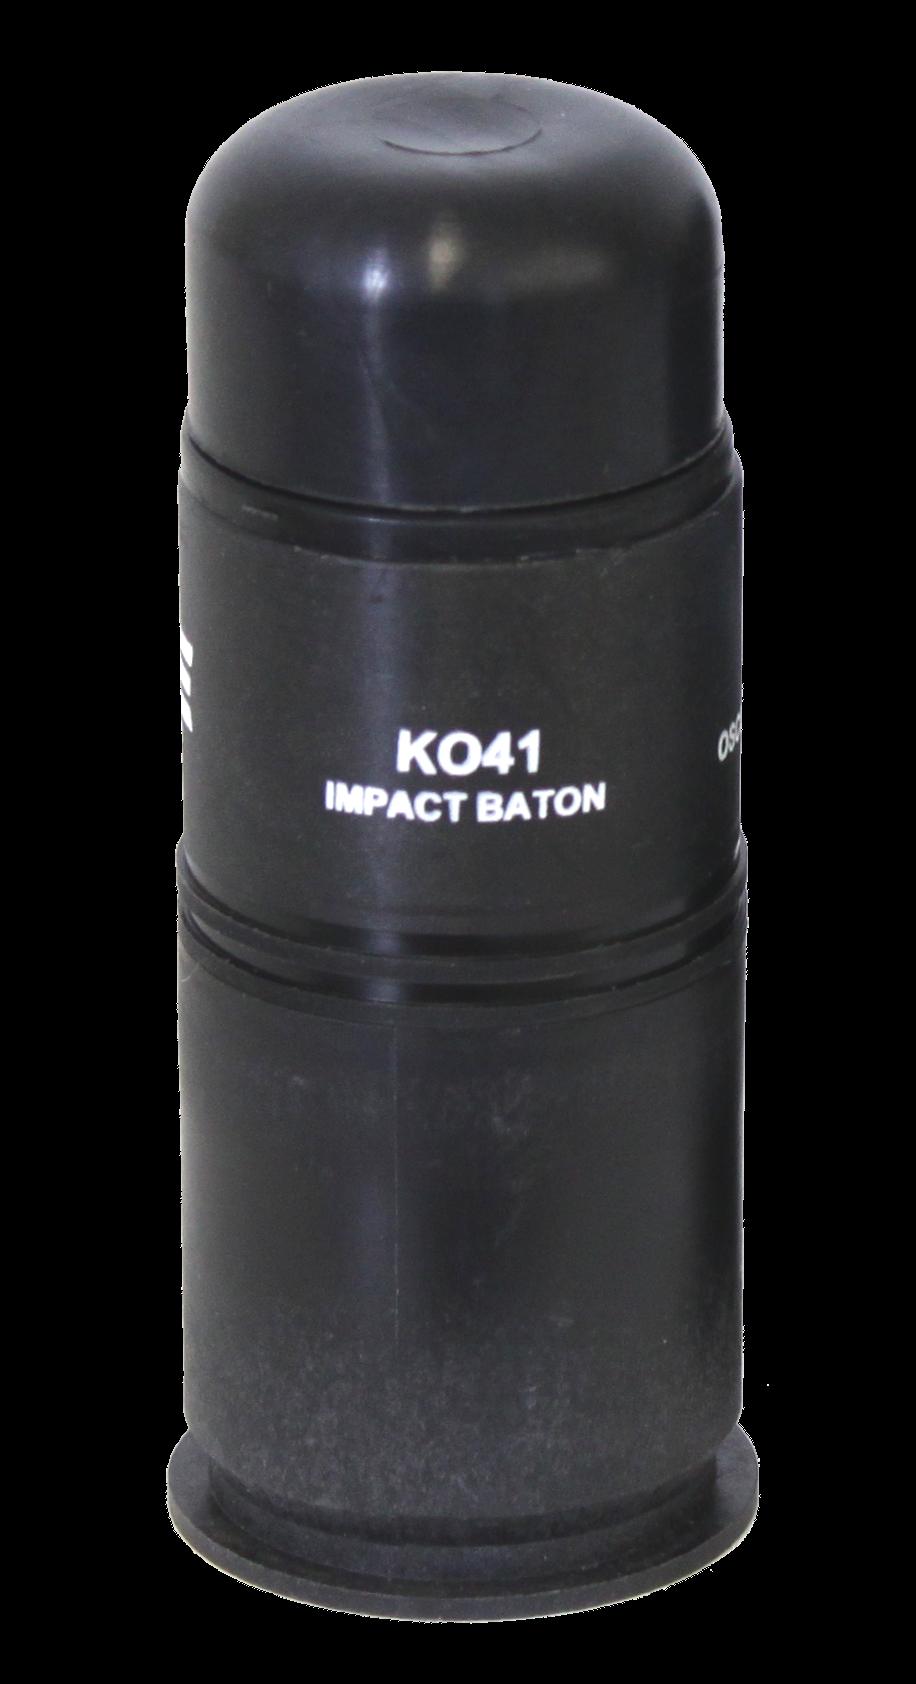 Blunt Impact Rounds K041